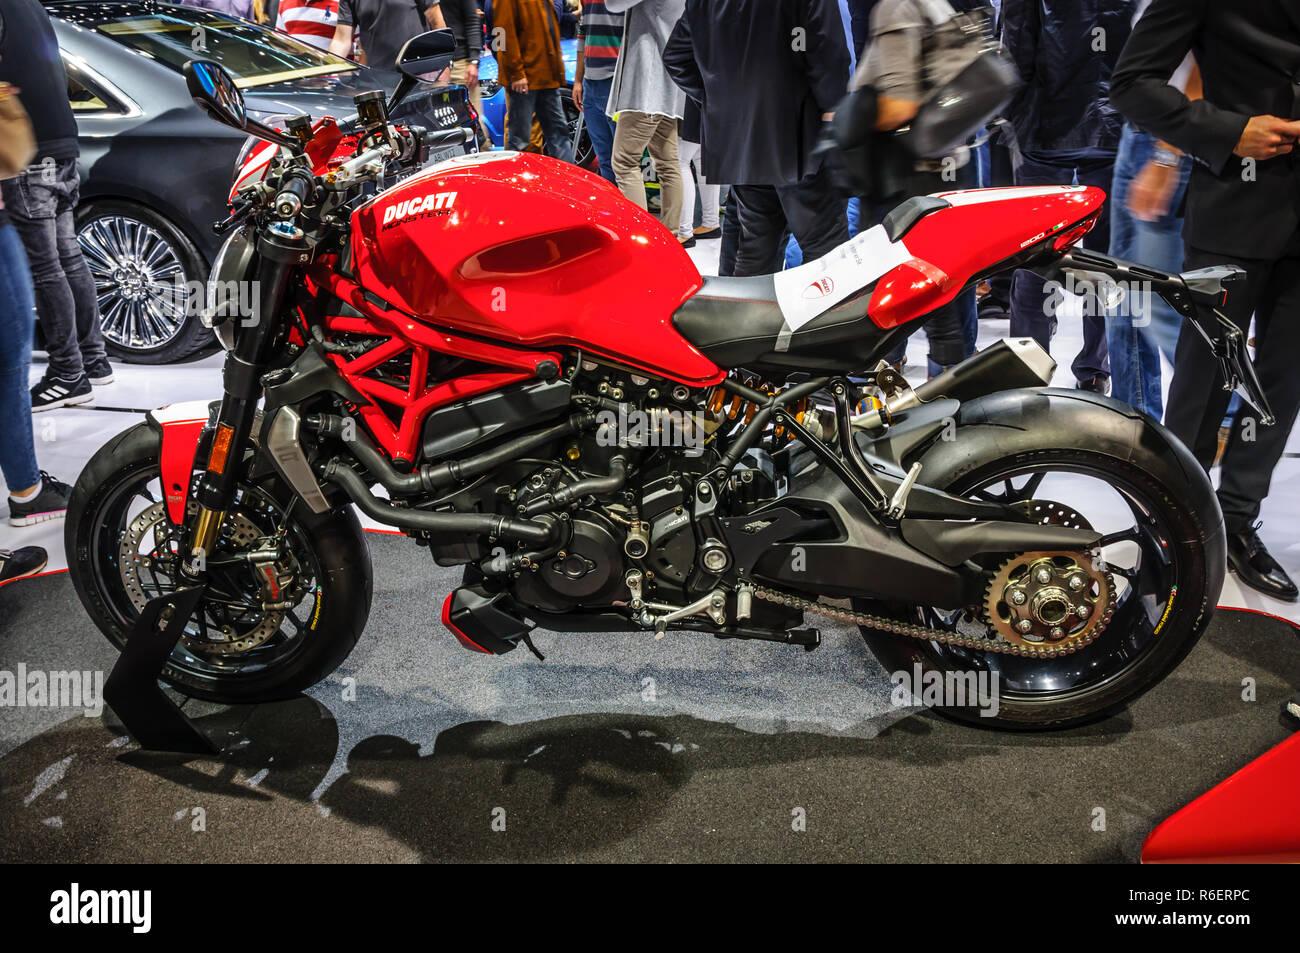 FRANKFURT - SEPT 2015: Ducati Streetfighter 848 presented at IAA International Motor Show on September 20, 2015 in Frankfurt, Germany - Stock Image